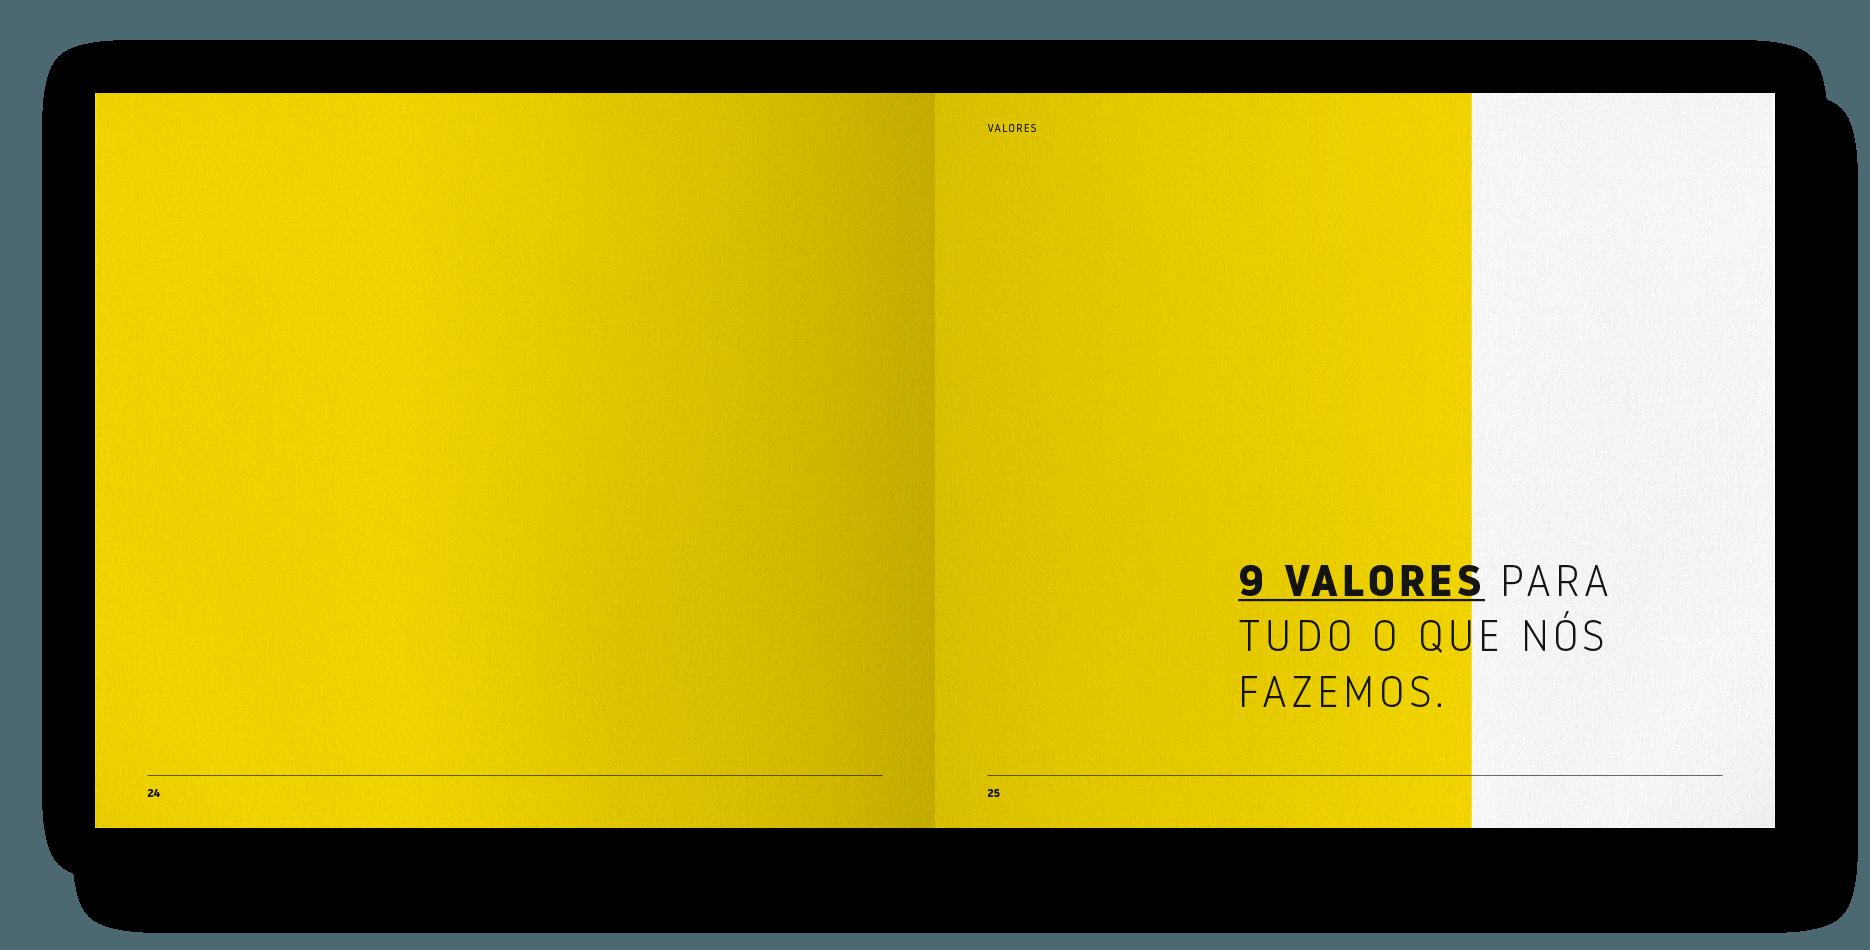 tr10-strategy-13-brandbook